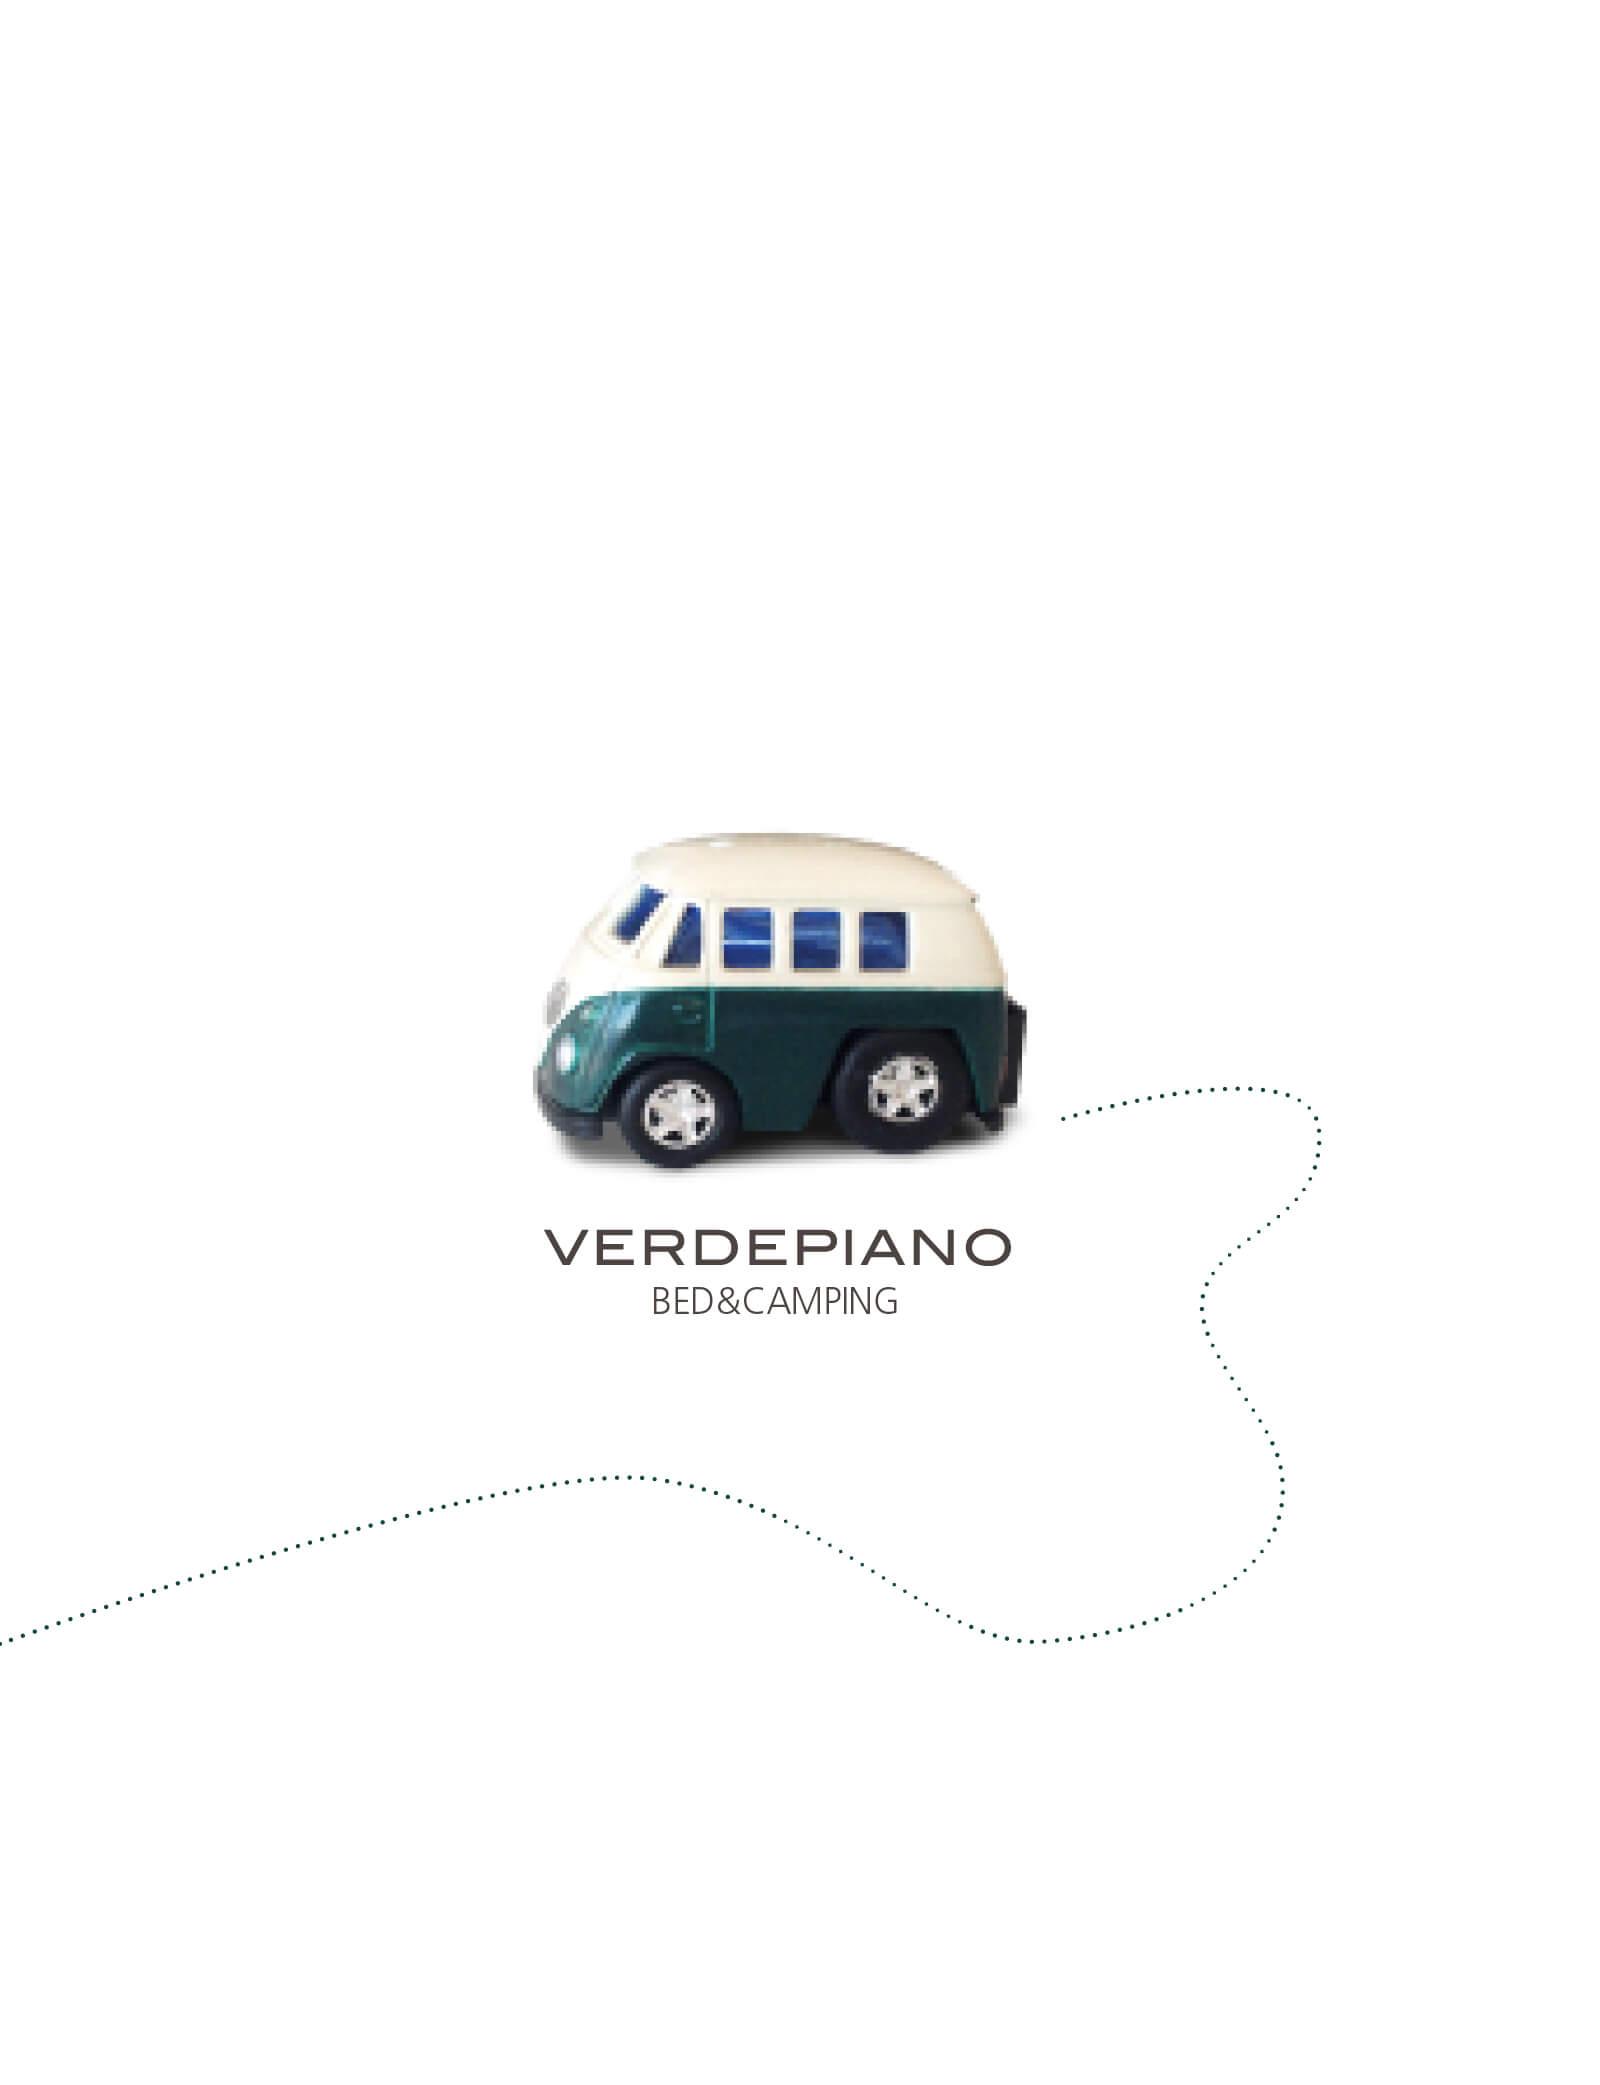 diade-studio-camping-verdepiano-naming-e-progetto-logo-e-segnaletica111122